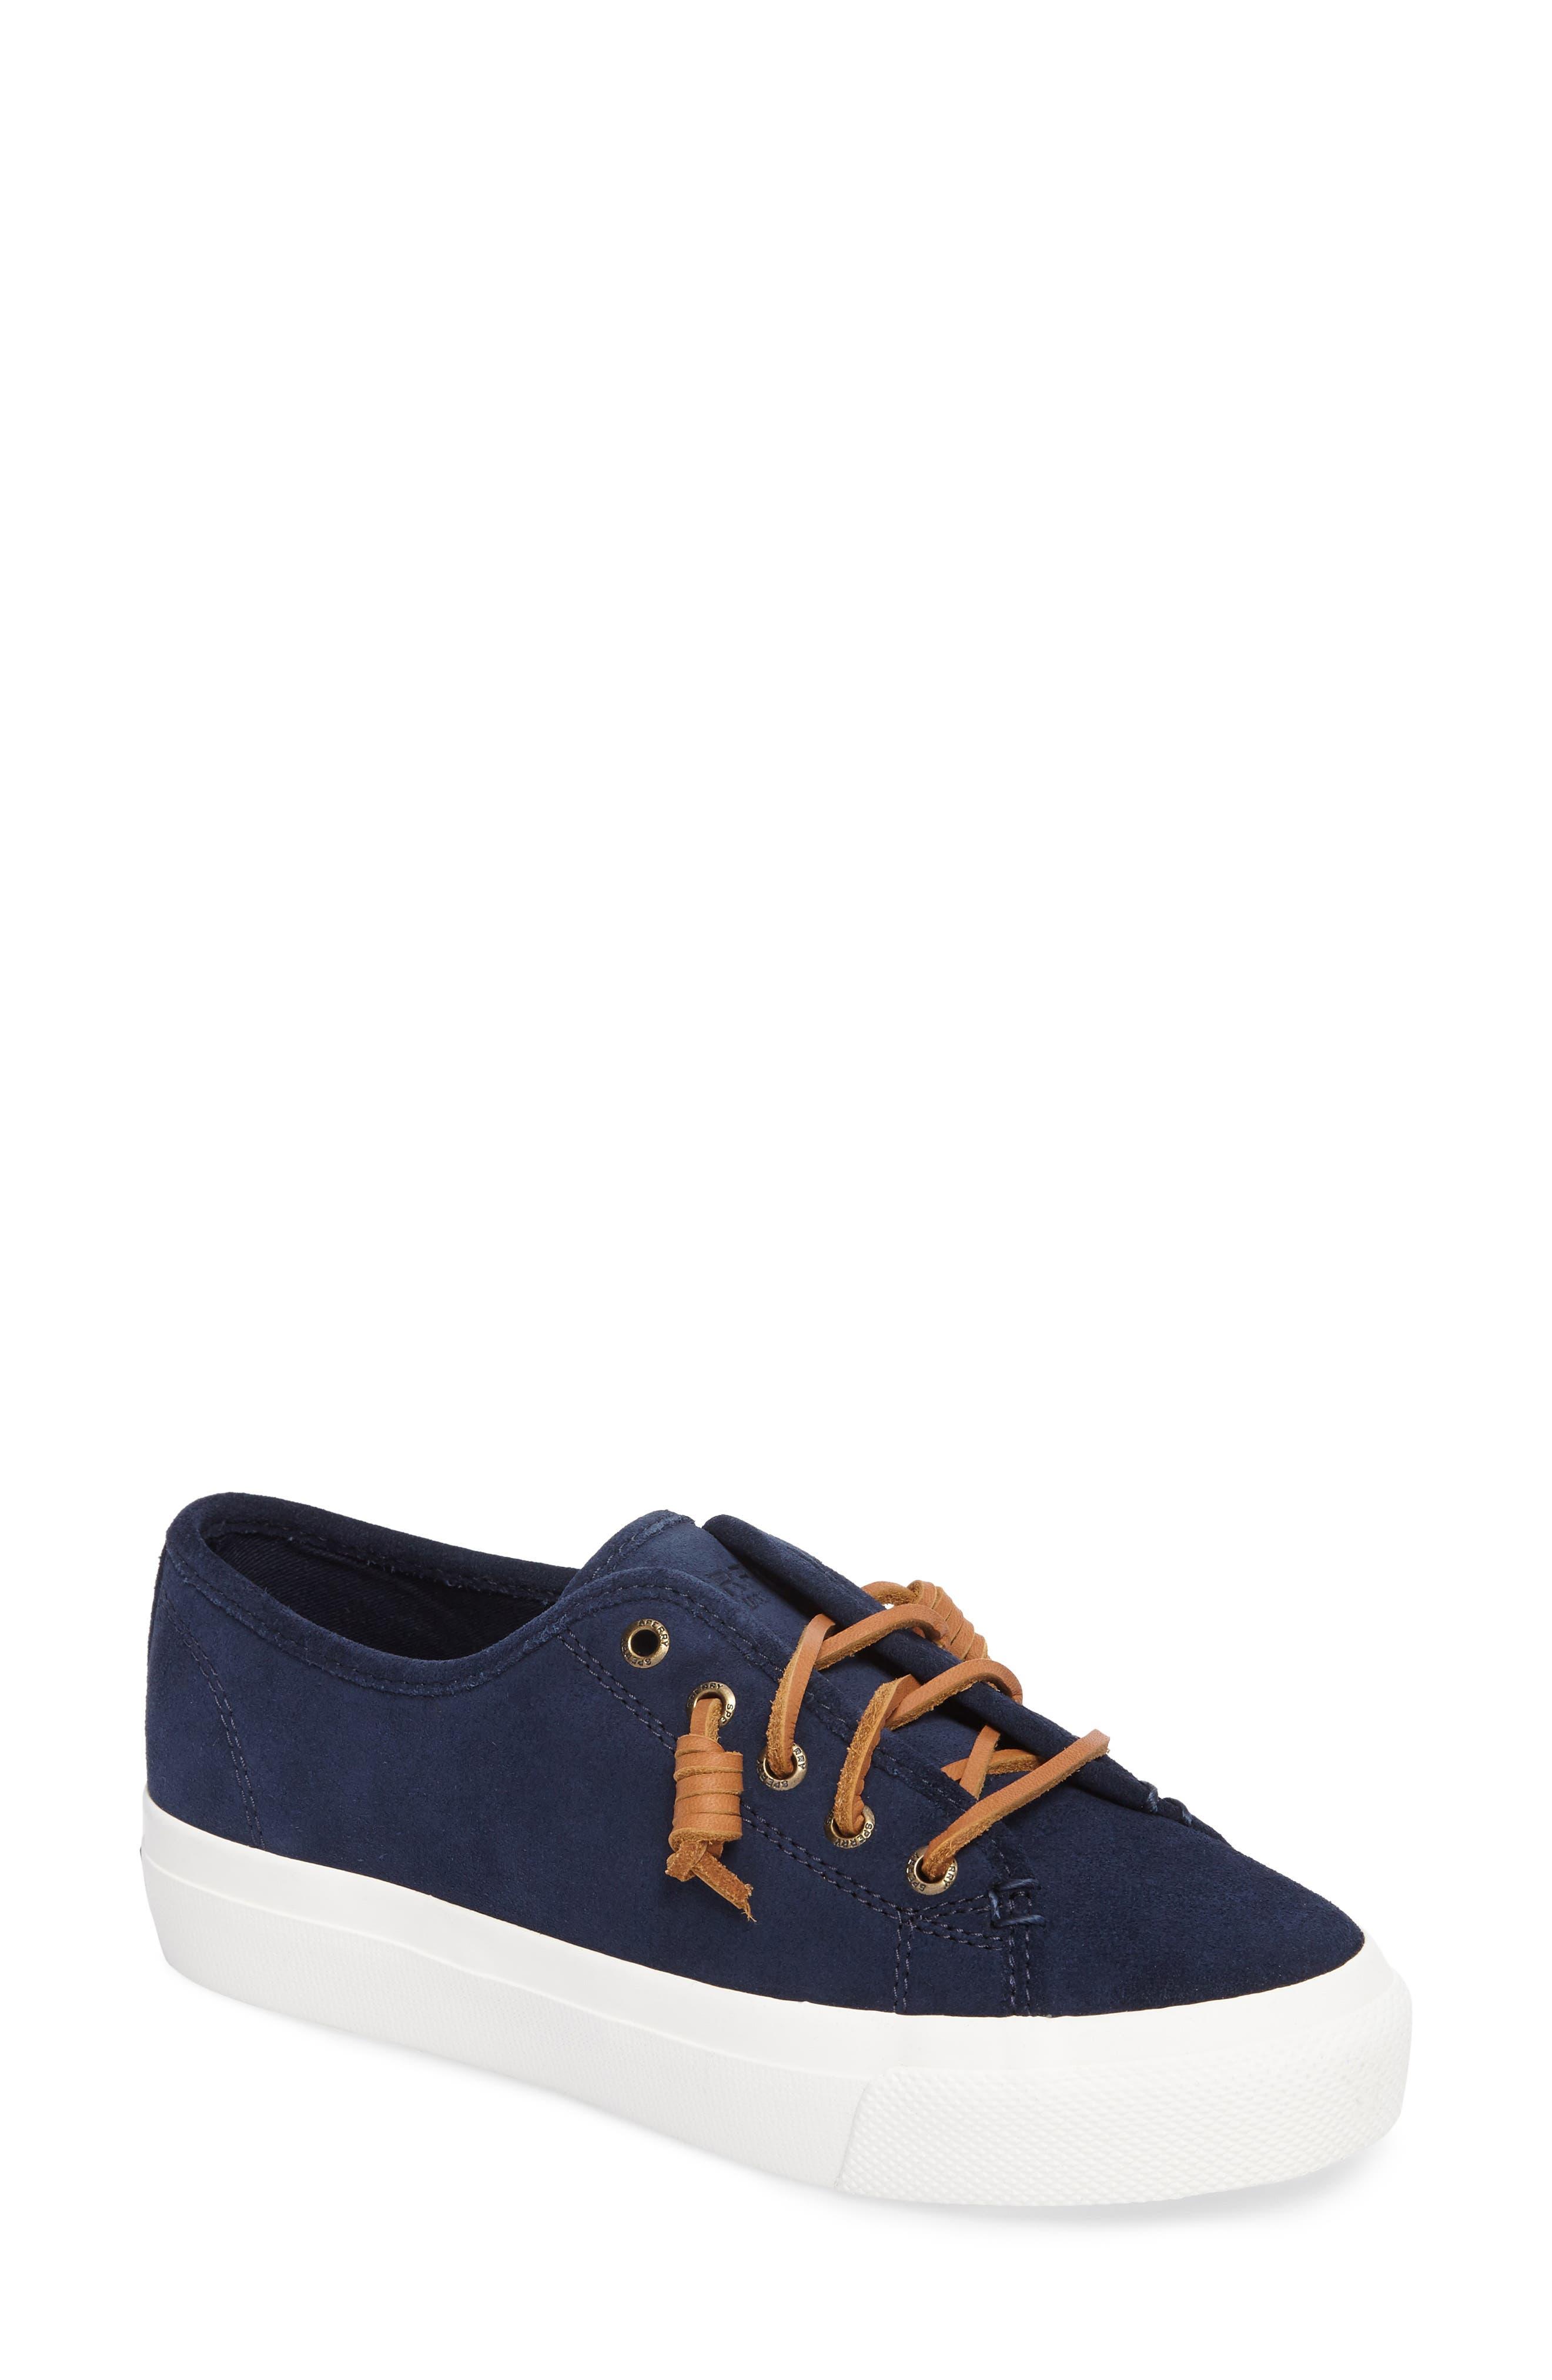 Sky Sail Platform Sneaker,                         Main,                         color, 410